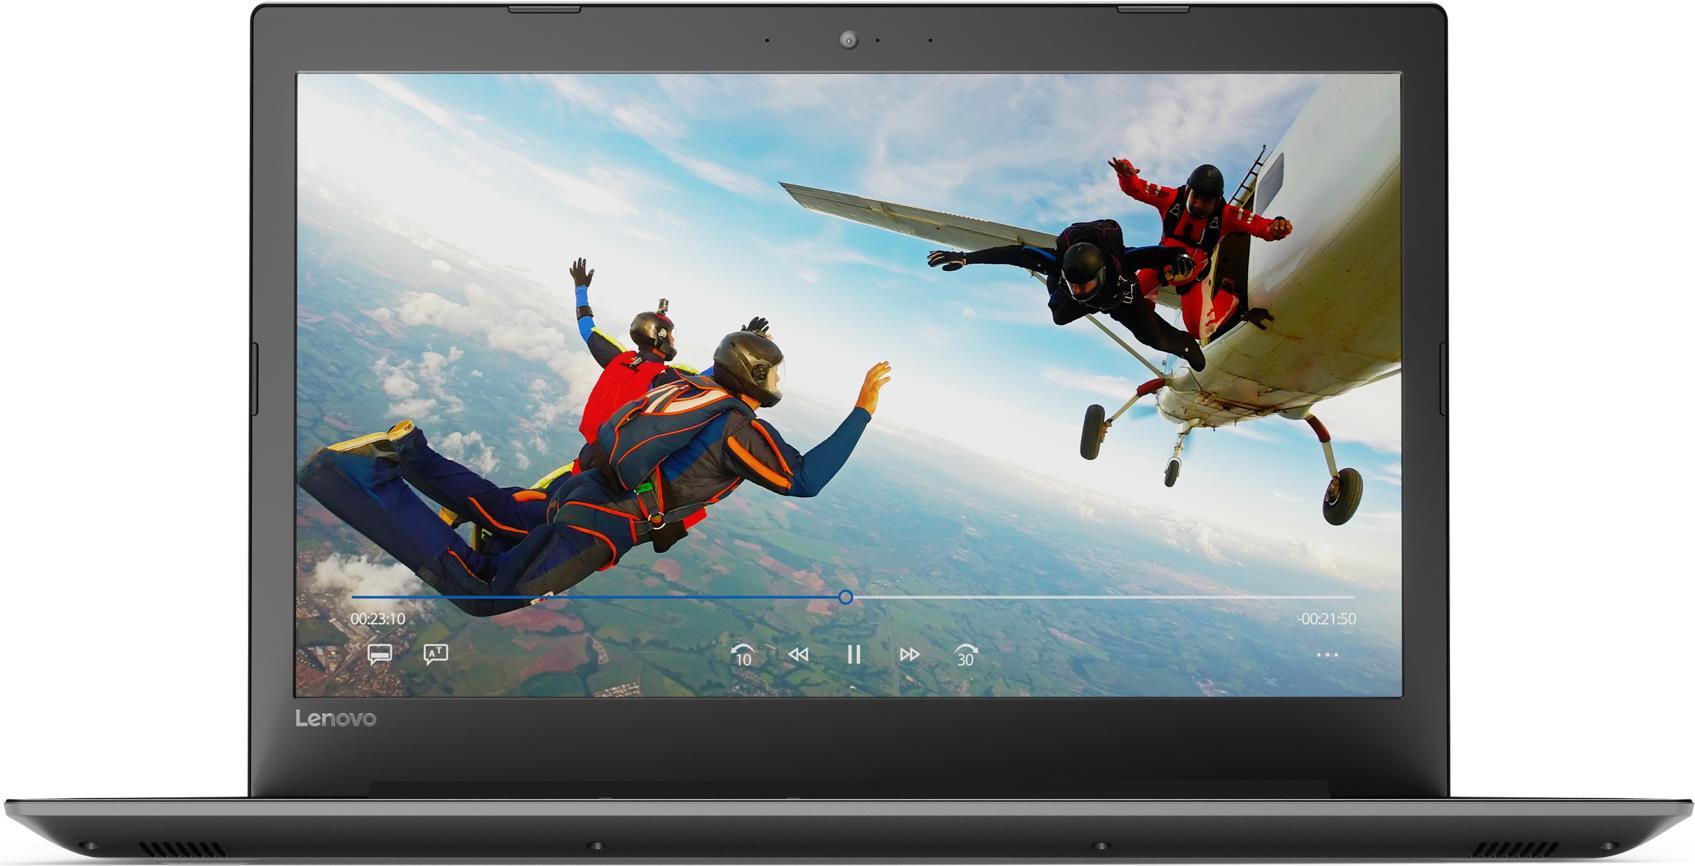 Notebooks, Laptops - Lenovo 320 17IKB 80XM Pentium 4415U 2.3 GHz FreeDOS 4 GB RAM 128 GB SSD 43.9 cm (17.3) TN 1600 x 900 (HD ) HD Graphics 610 Wi Fi, Bluetooth Onyx Black  - Onlineshop JACOB Elektronik